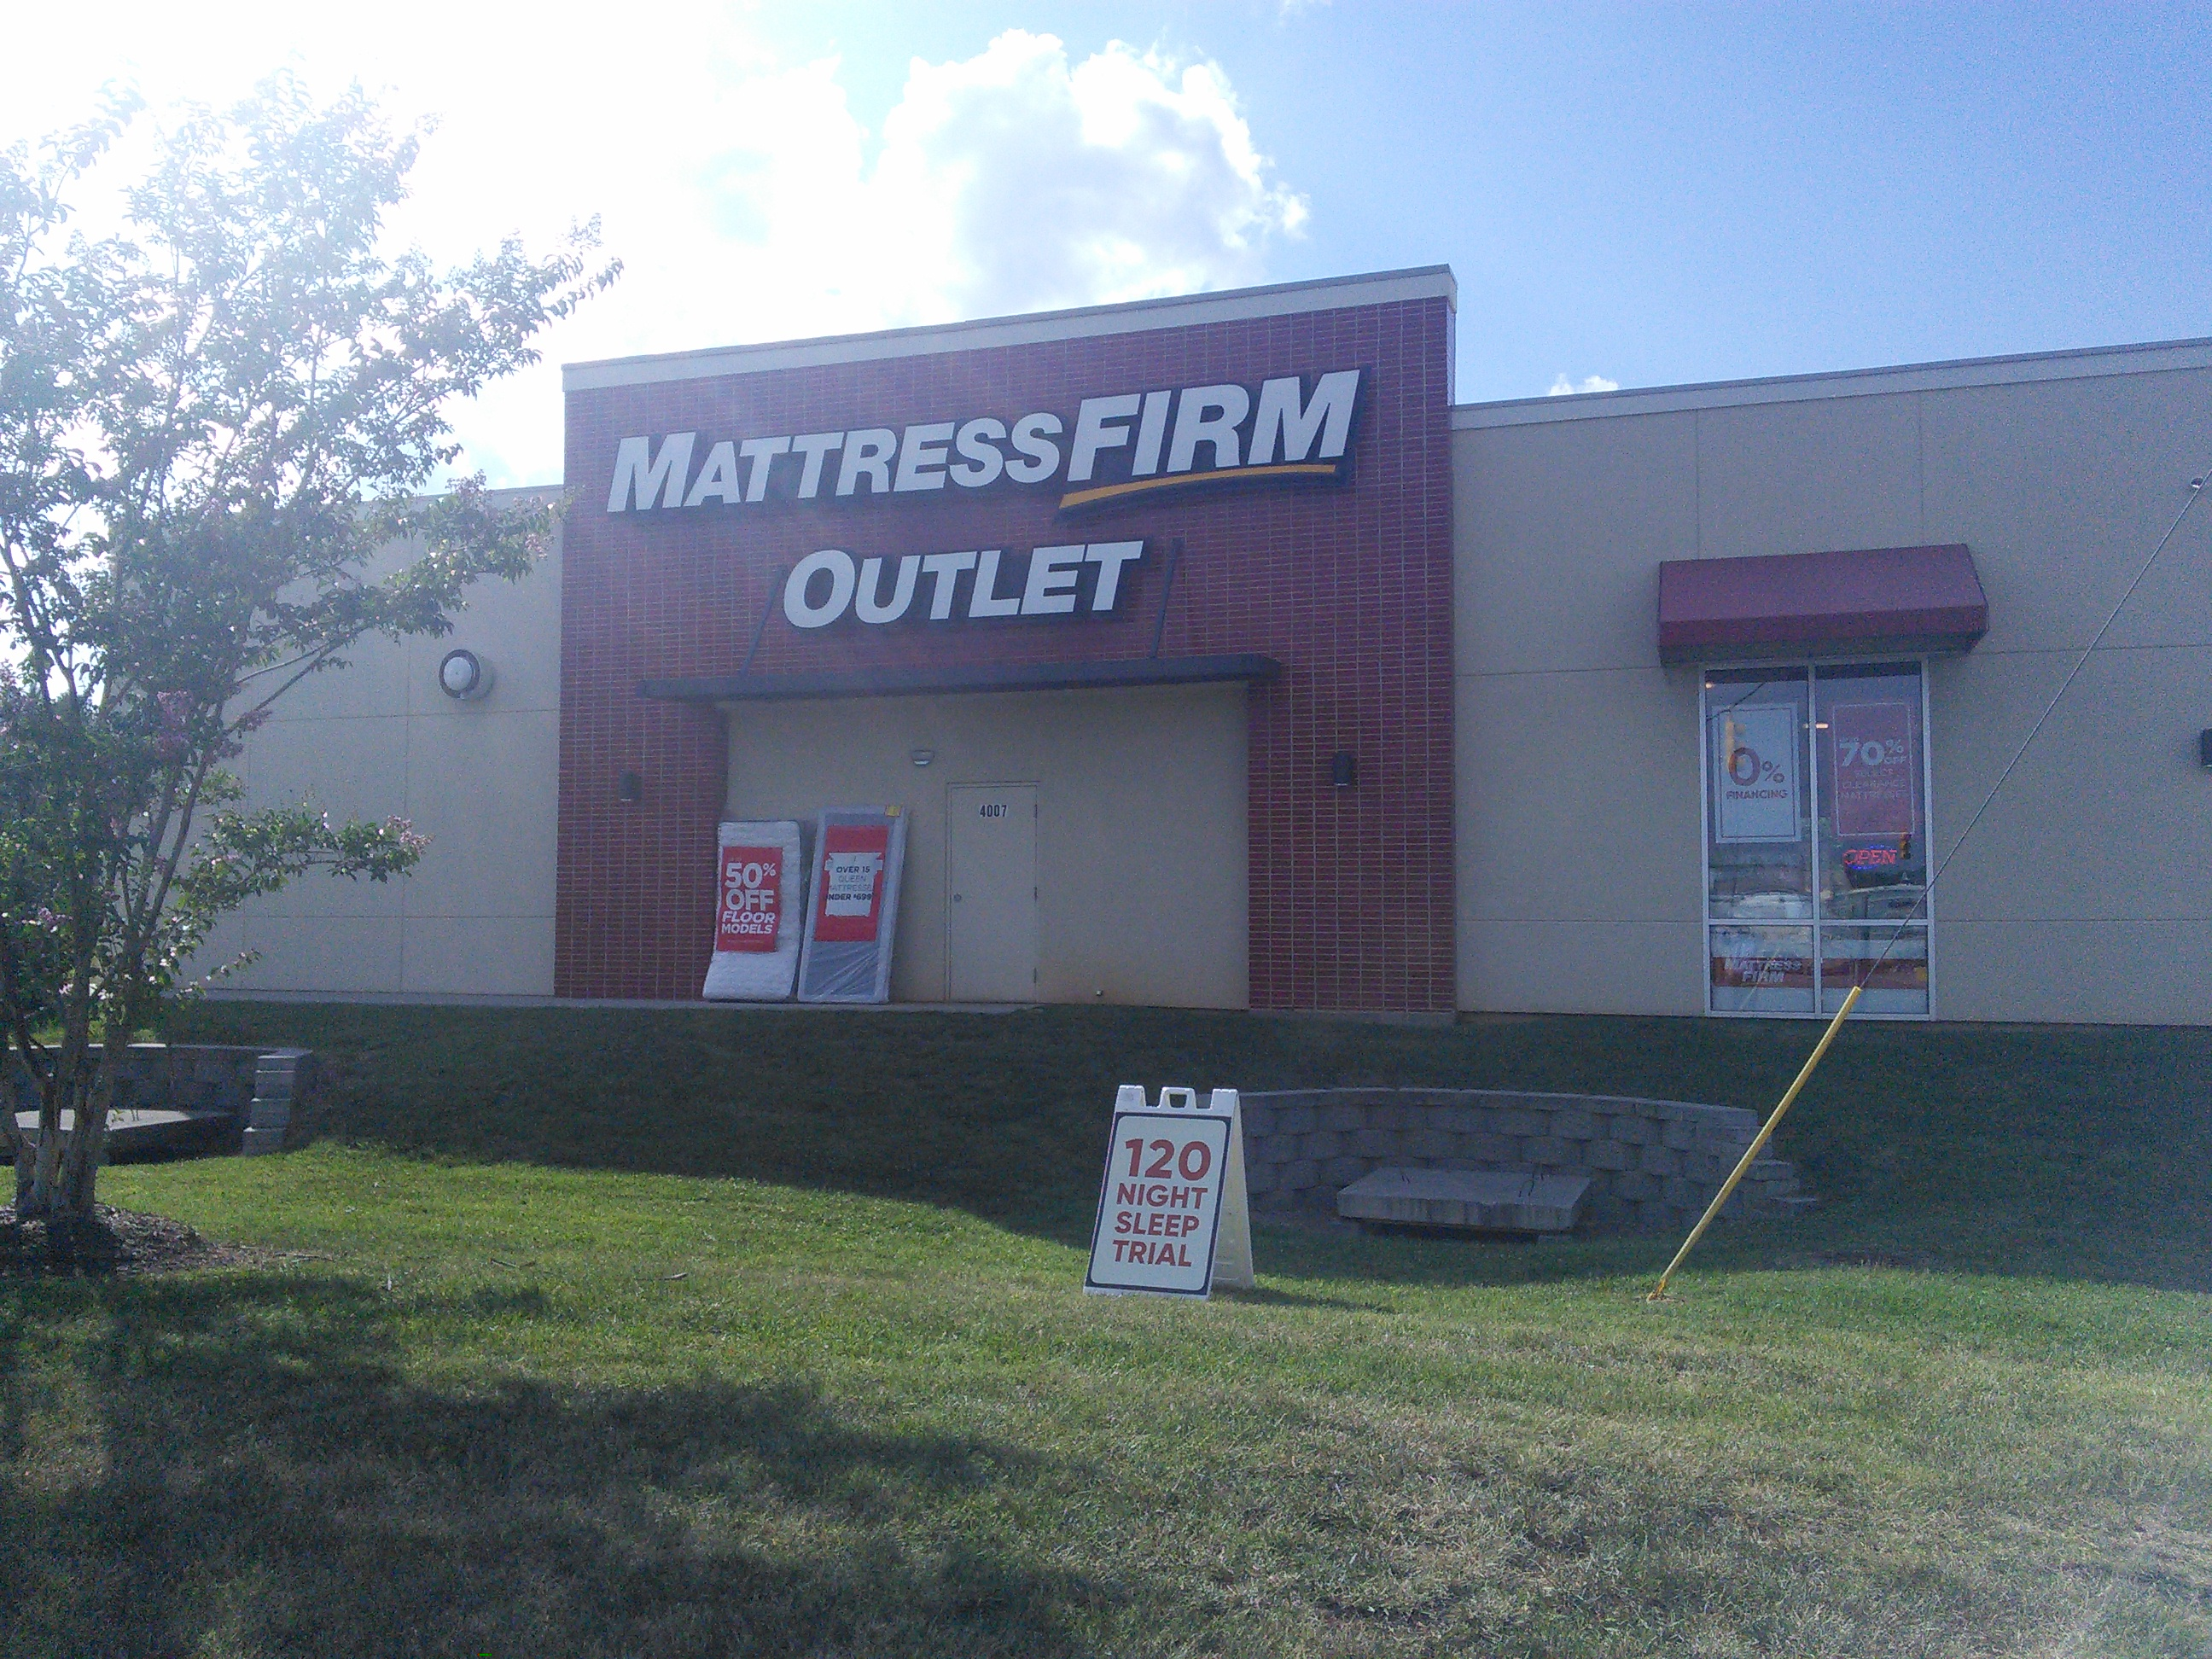 Mattress Firm Clearance 4007 Arrowhead Blvd, Mebane, NC